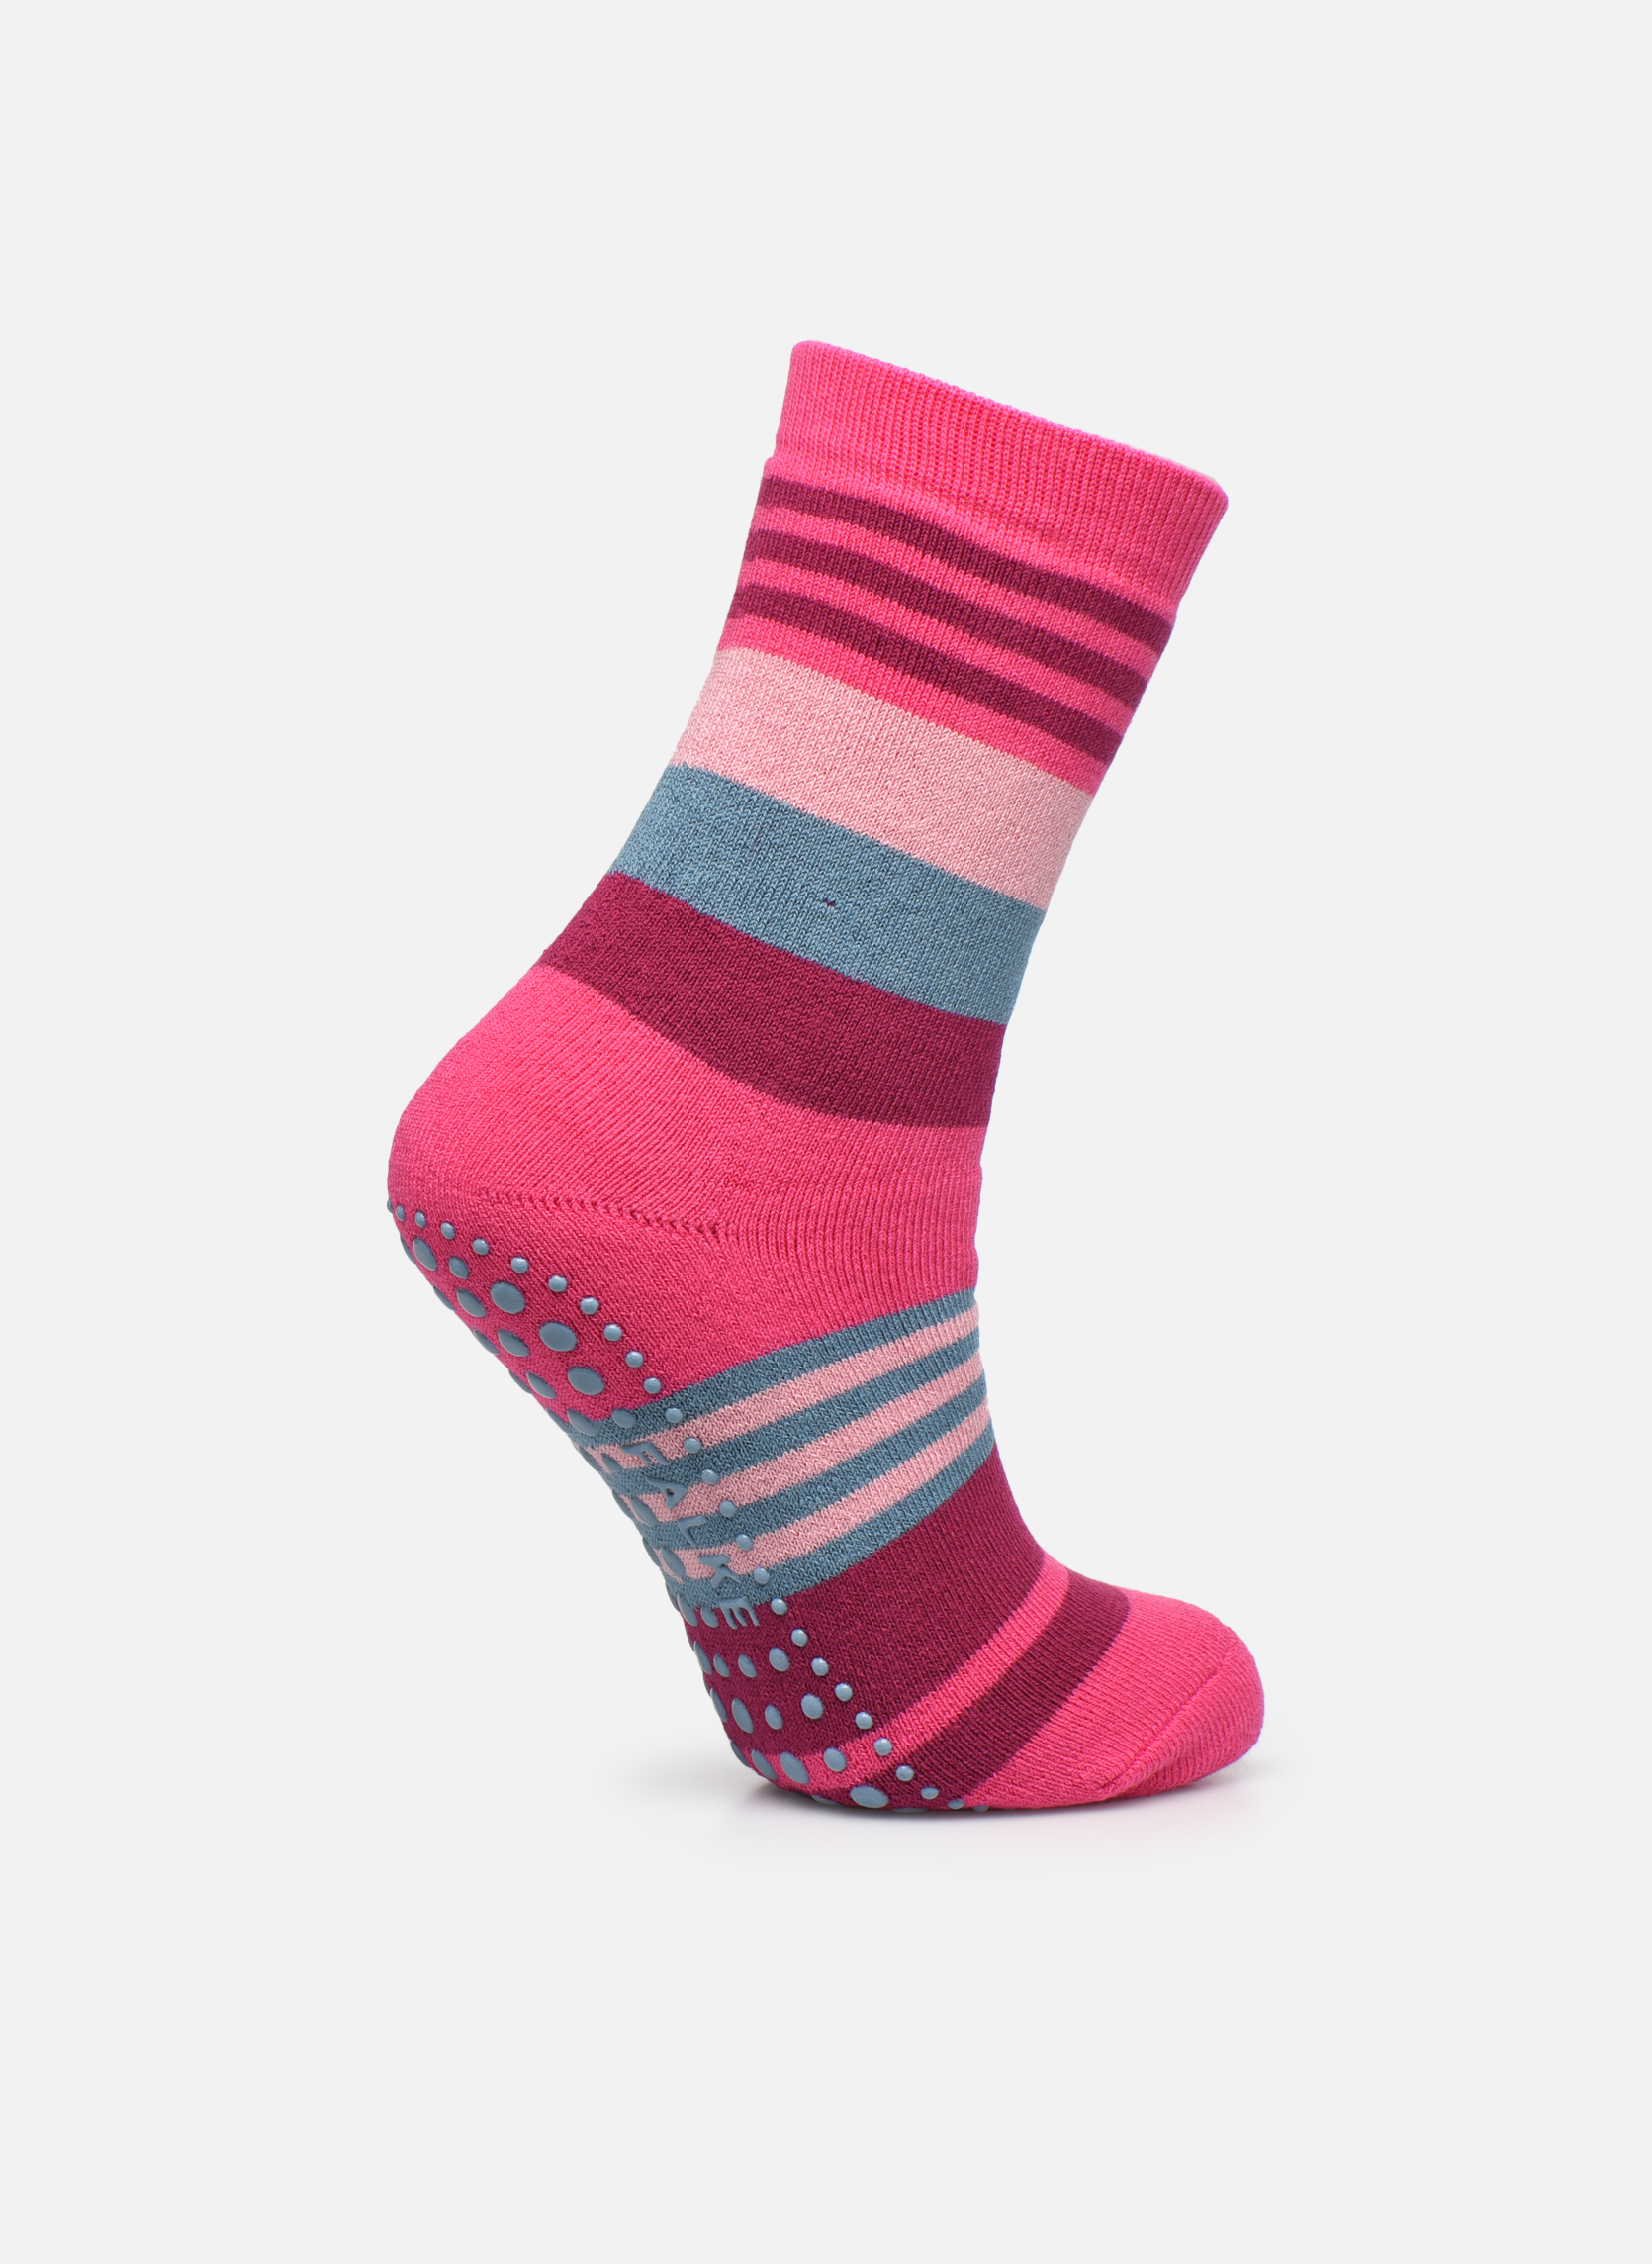 Chaussons-chaussettes Irregular Stripe Catspads 8550